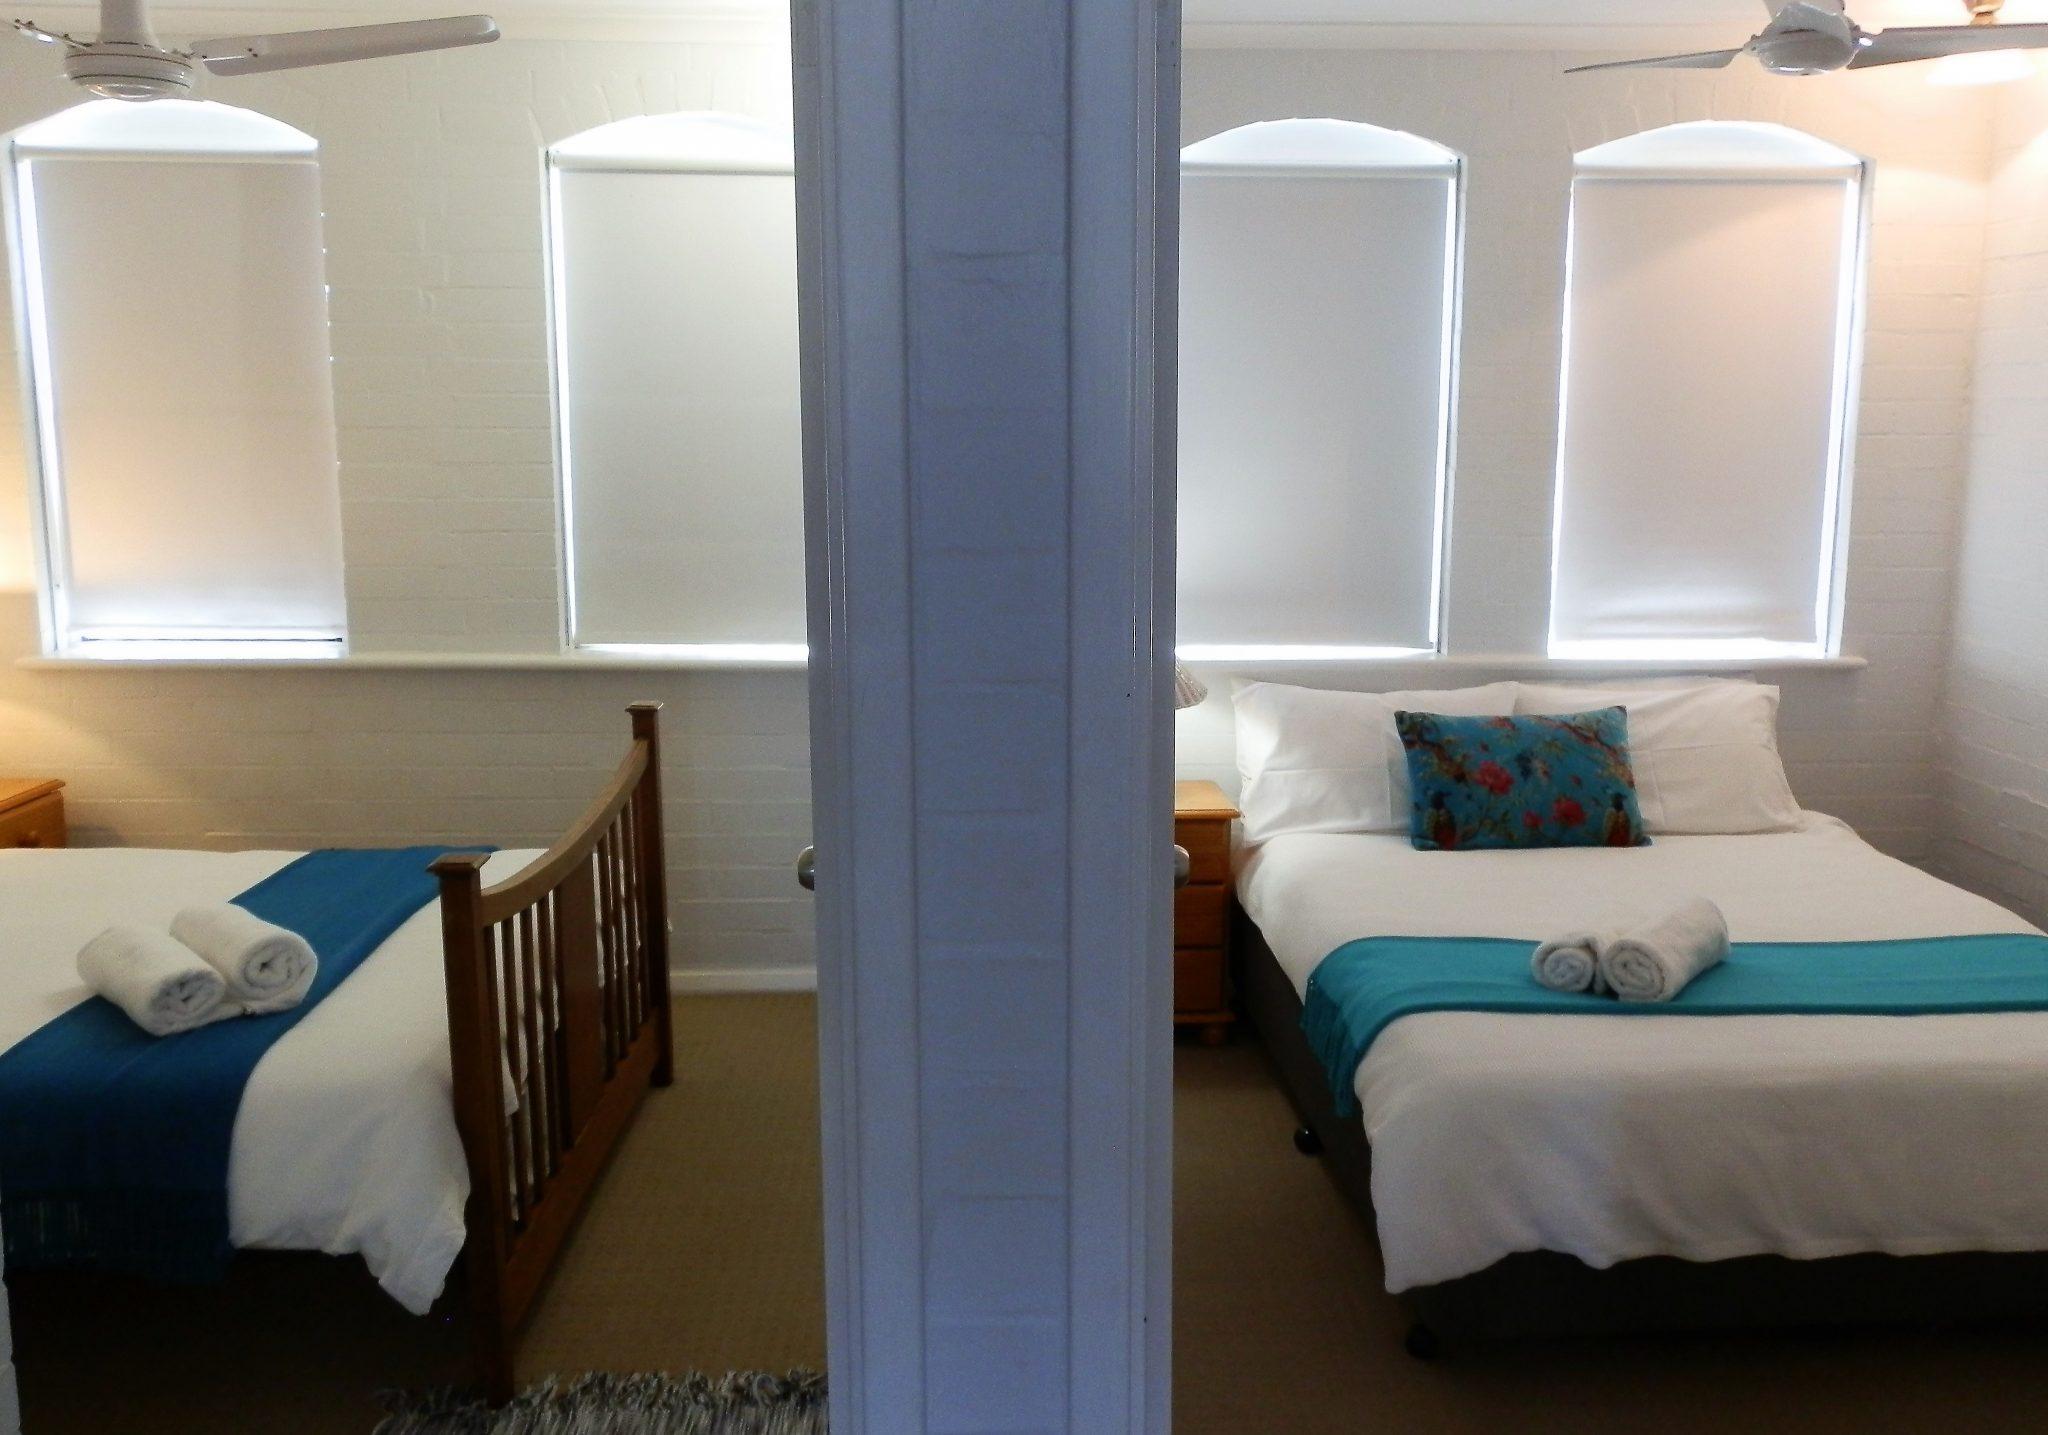 North facing bedrooms Suffolk street Villa Fremantle